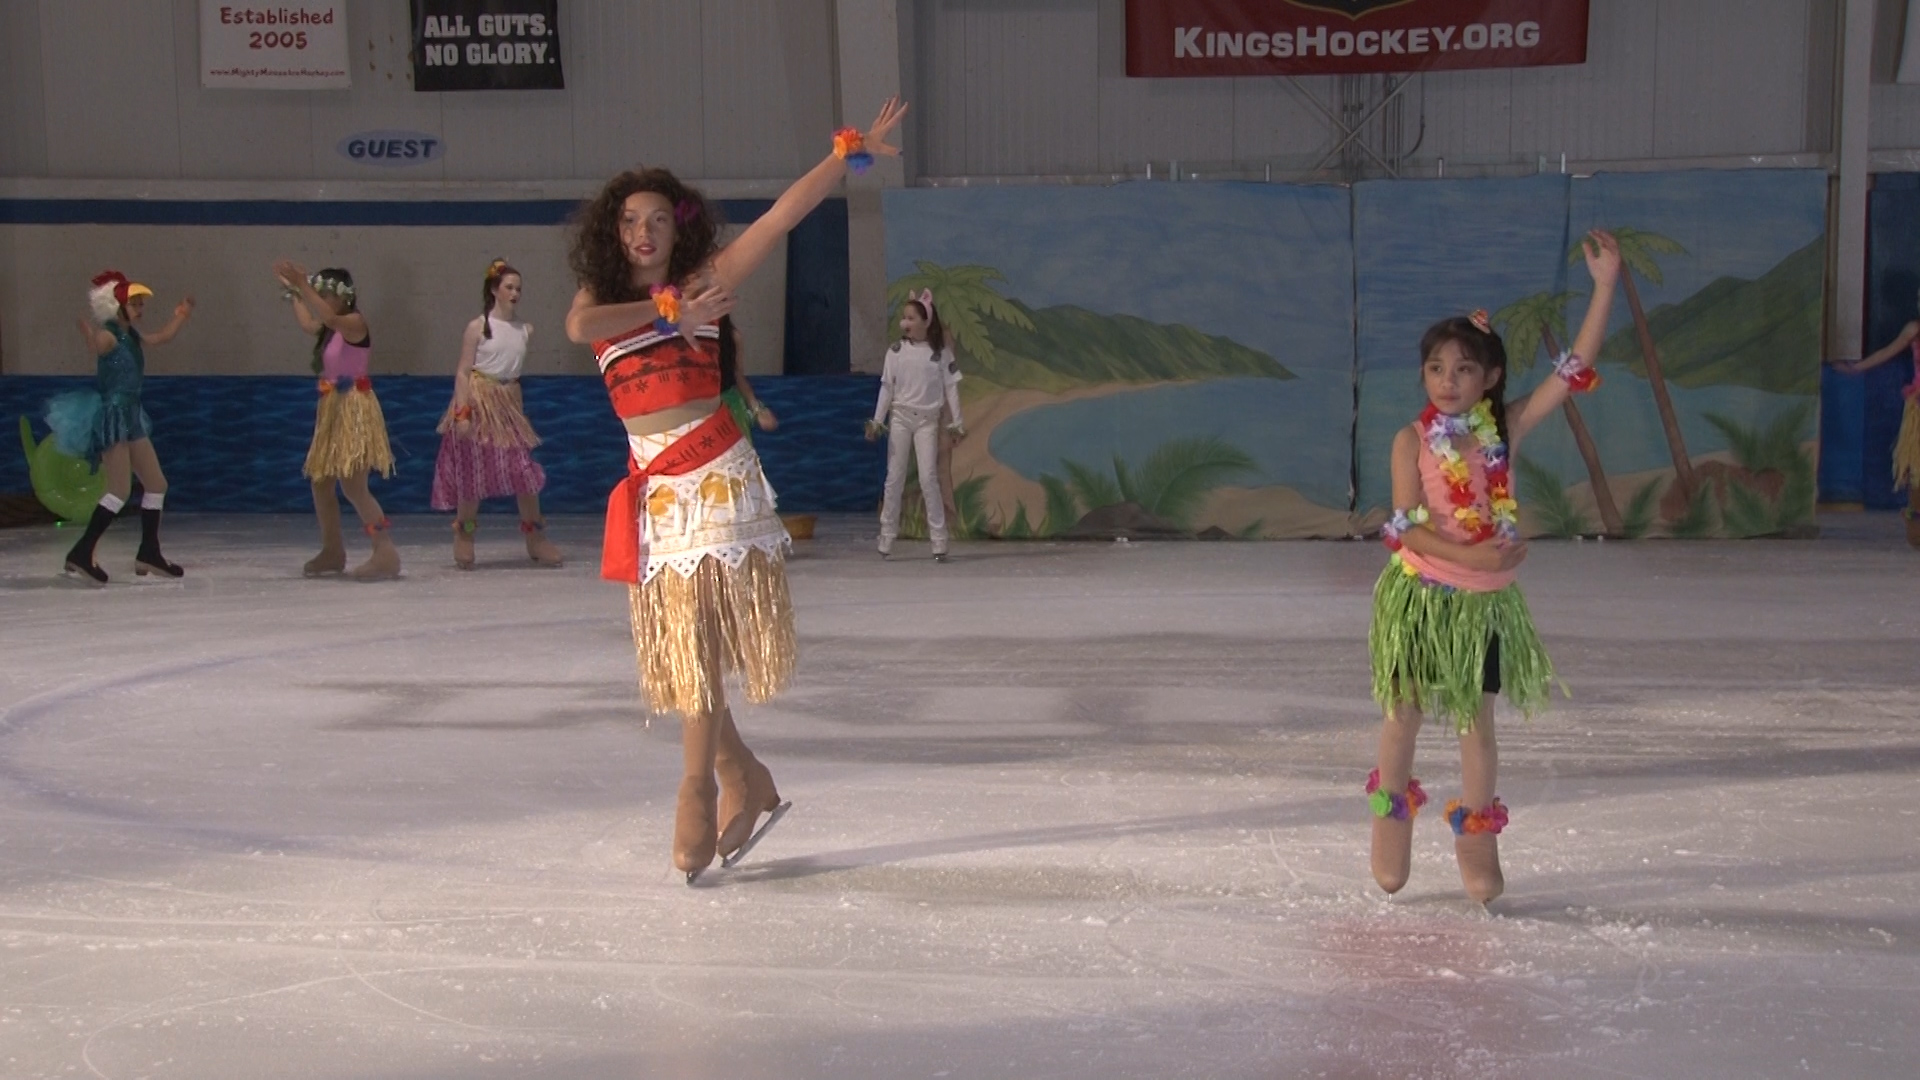 Power Play Maui Skate on Ice 071417.00_14_33_04.Still026.jpg